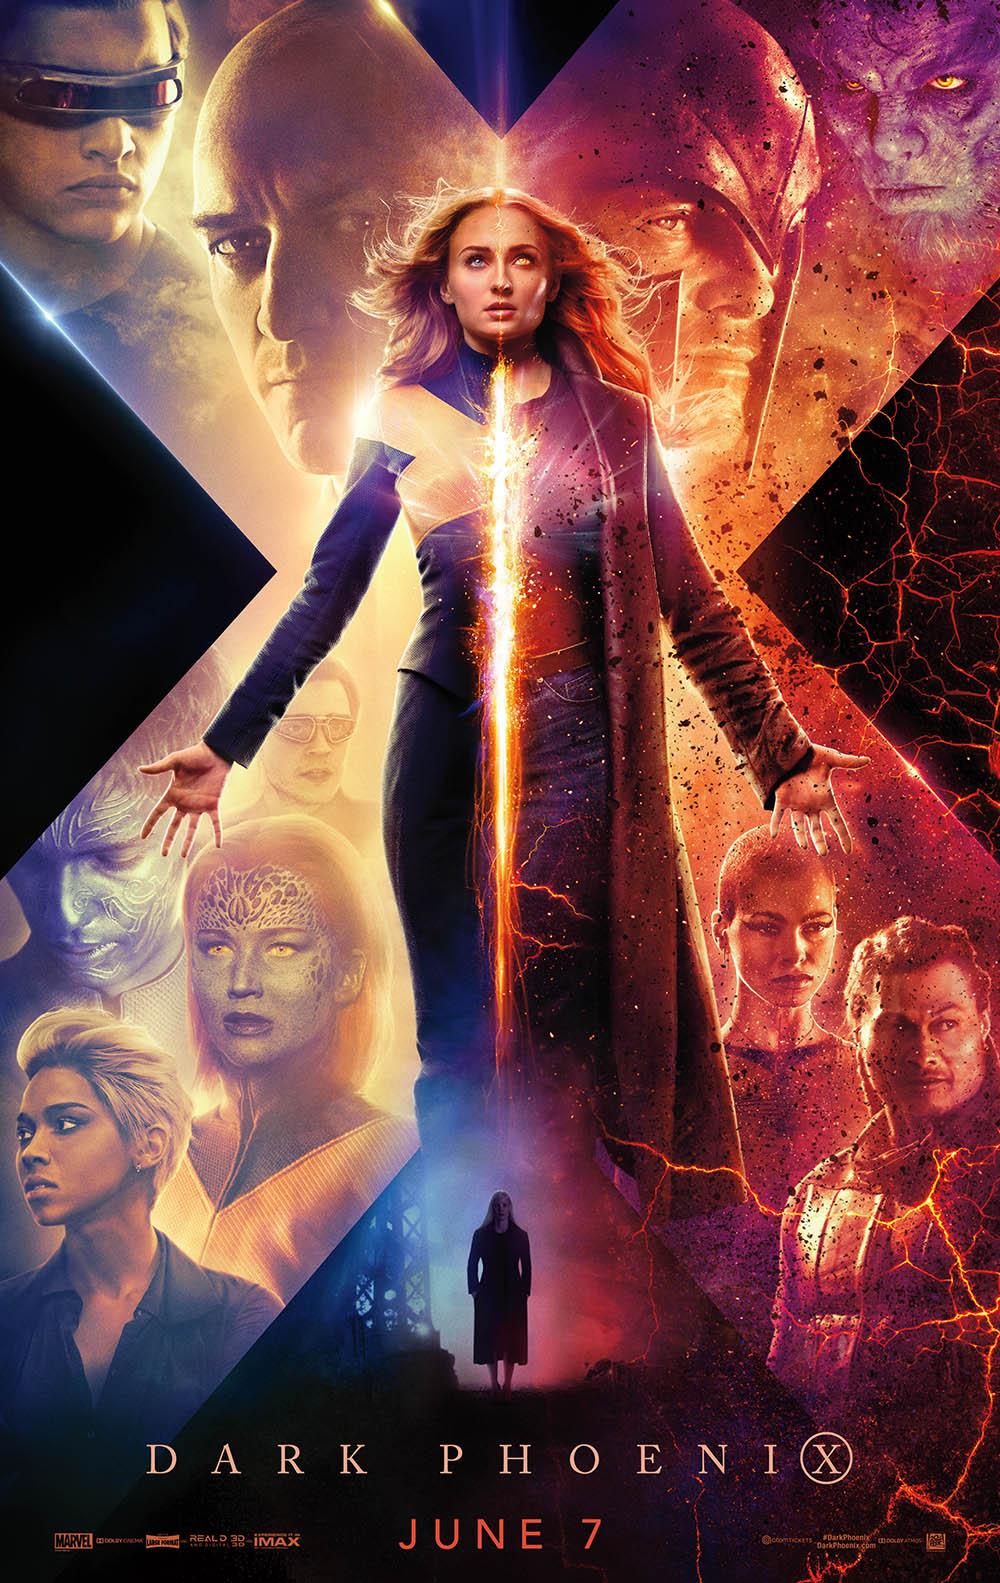 Dark-Phoenix-movie-2019-3d.JPG